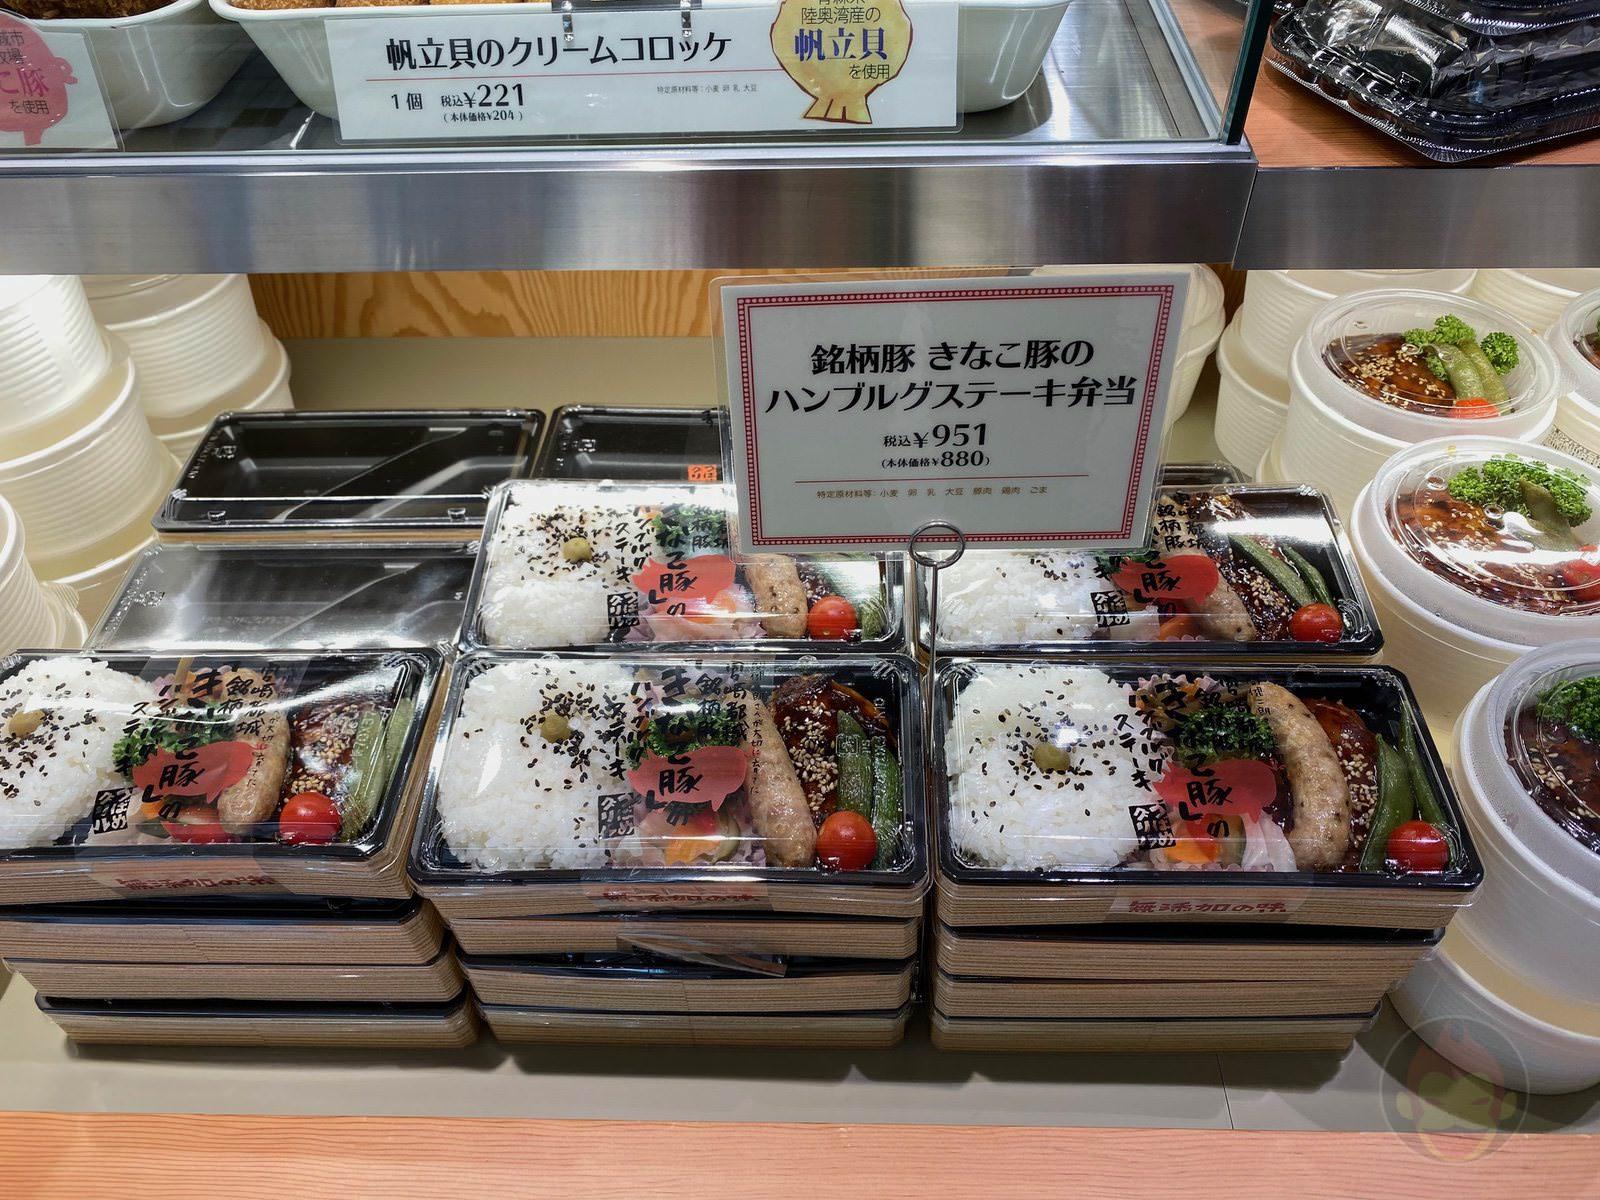 Shibuya-Scramble-Square-Food-I-Ate-145.jpeg